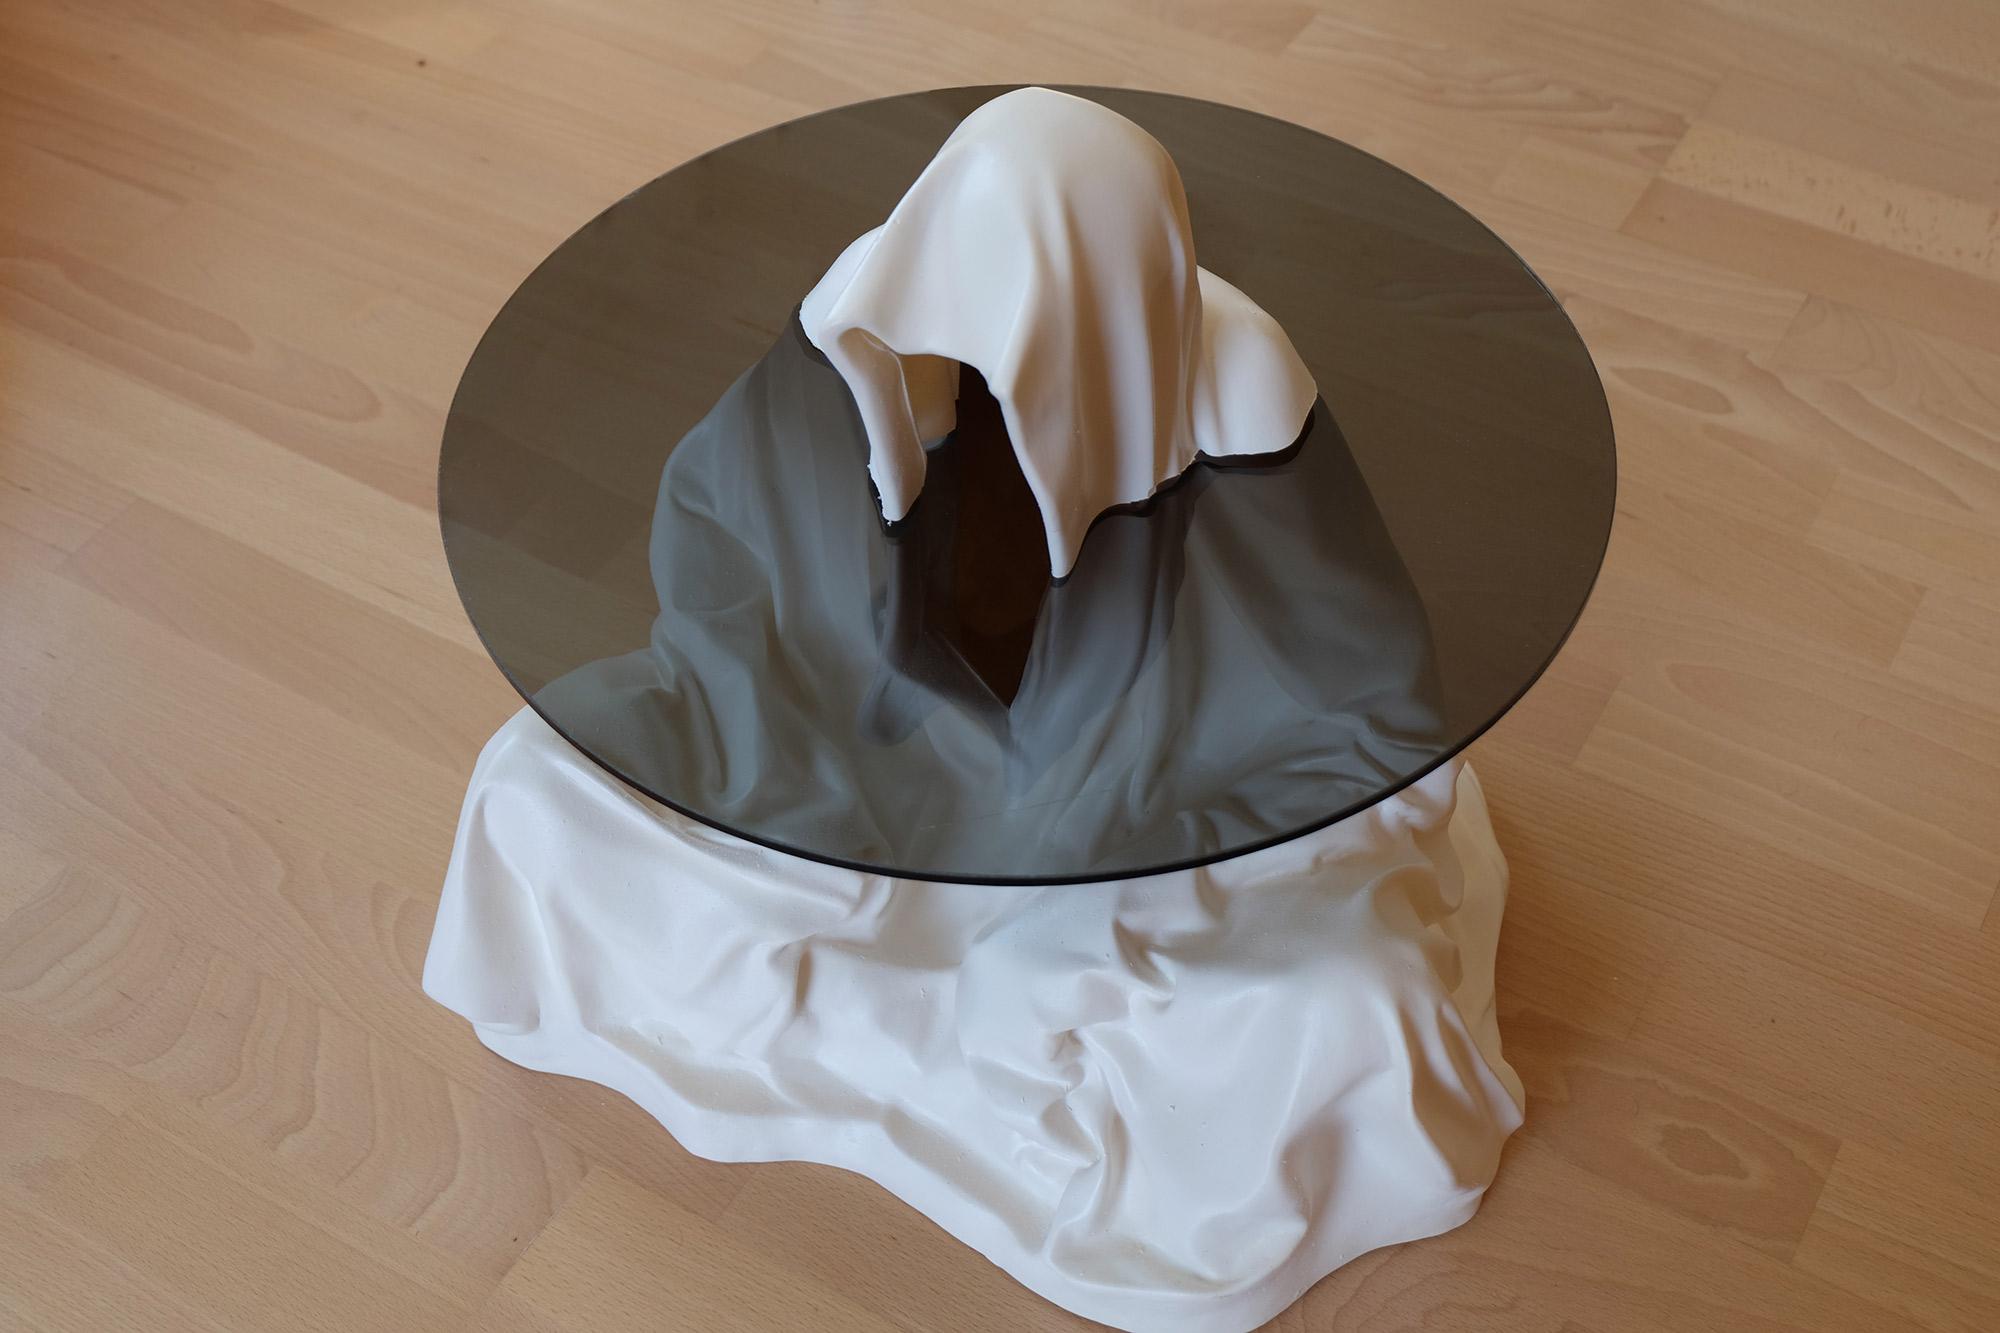 guardian-glass-tabel-furniture-modern-design-contemporary-art-arts-fineart-statue-sculpture-arte-manfred-kili-kielnhofer-7968x